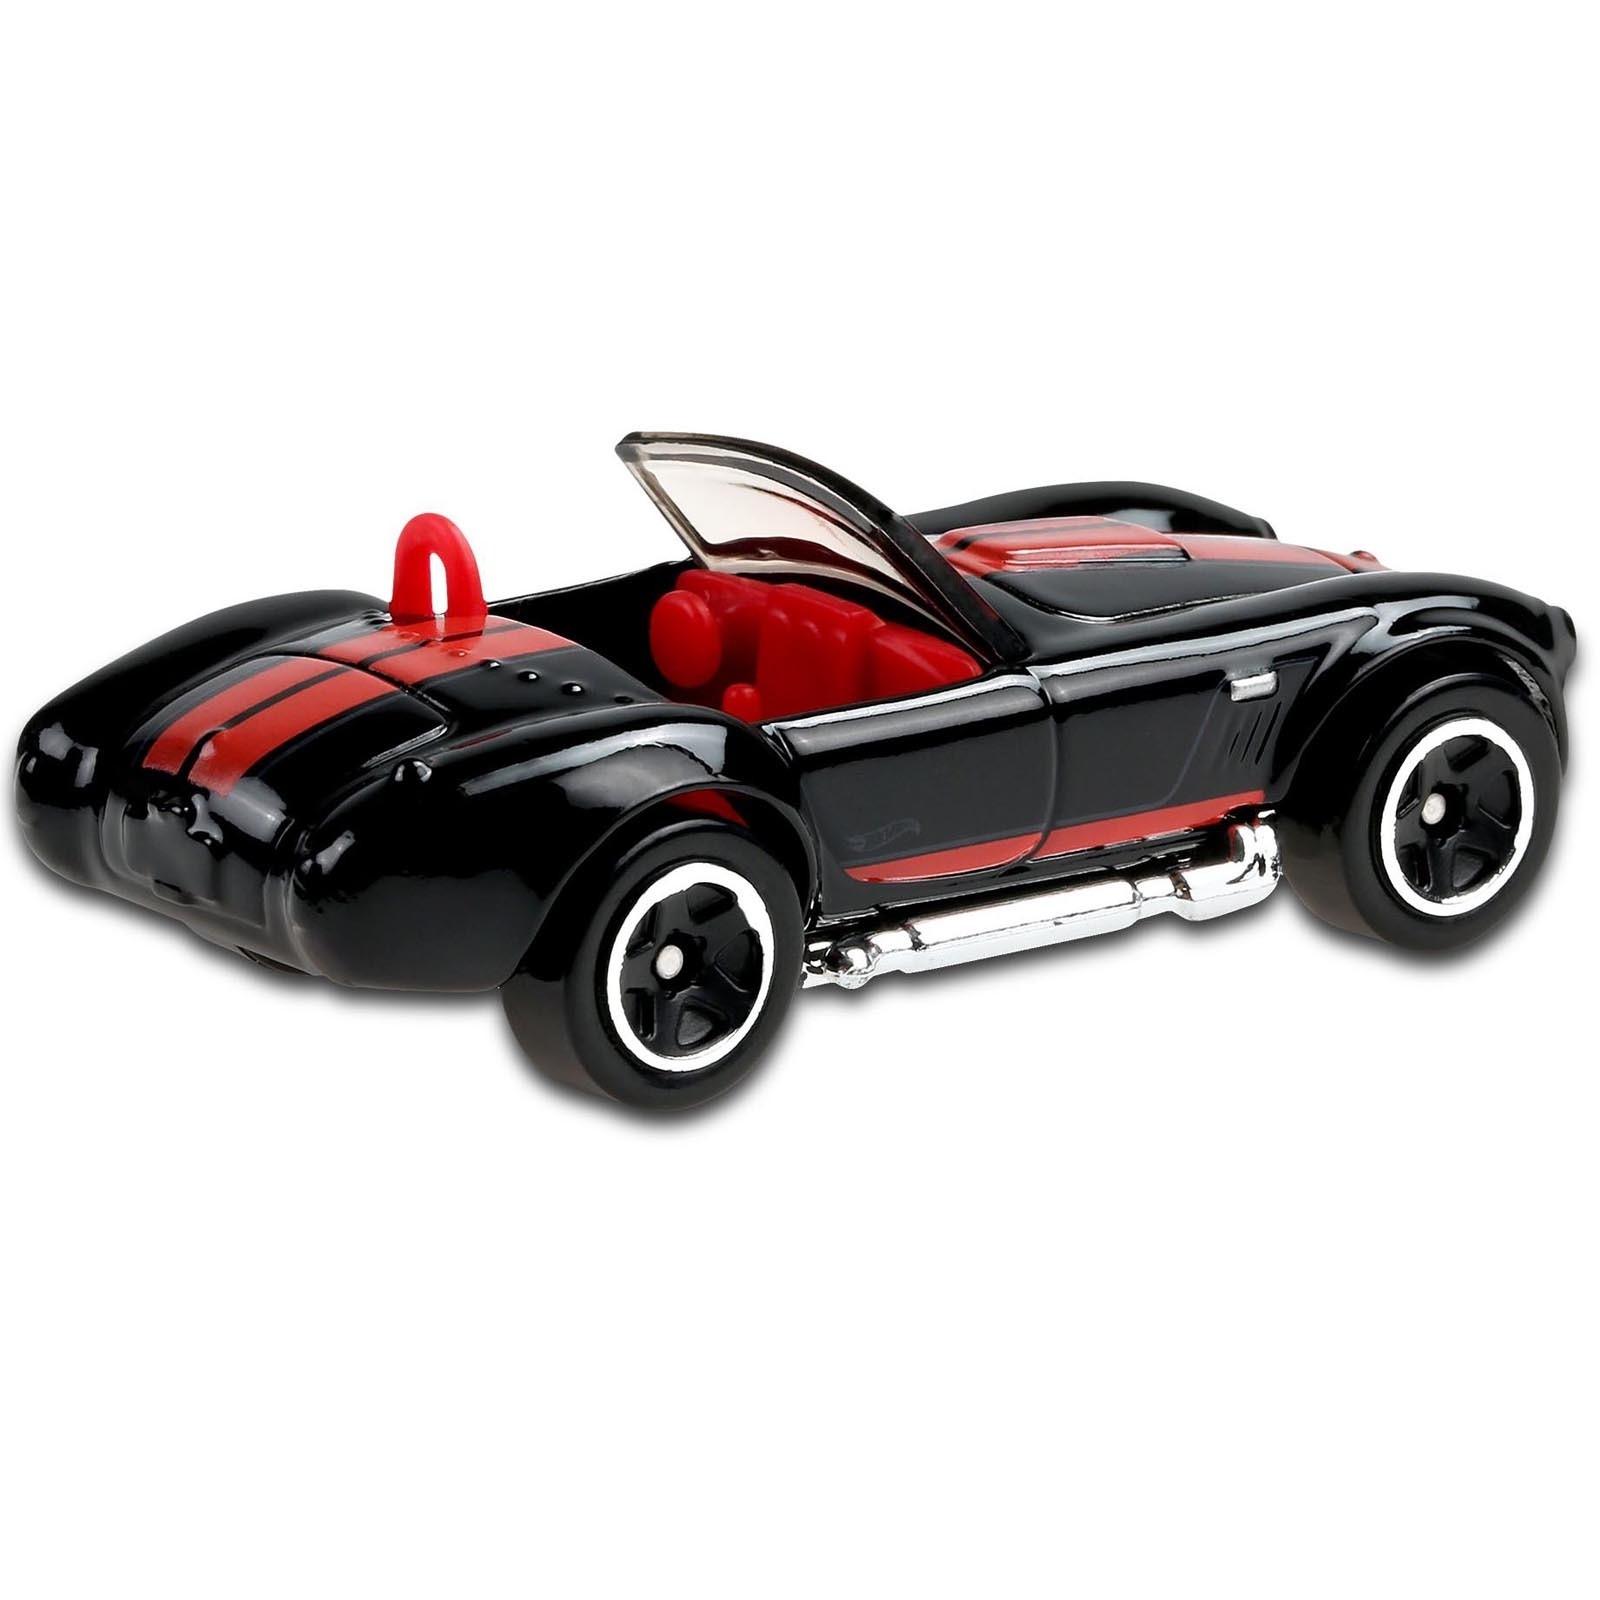 Hot Wheels - Shelby Cobra 427 S/C - GHC75